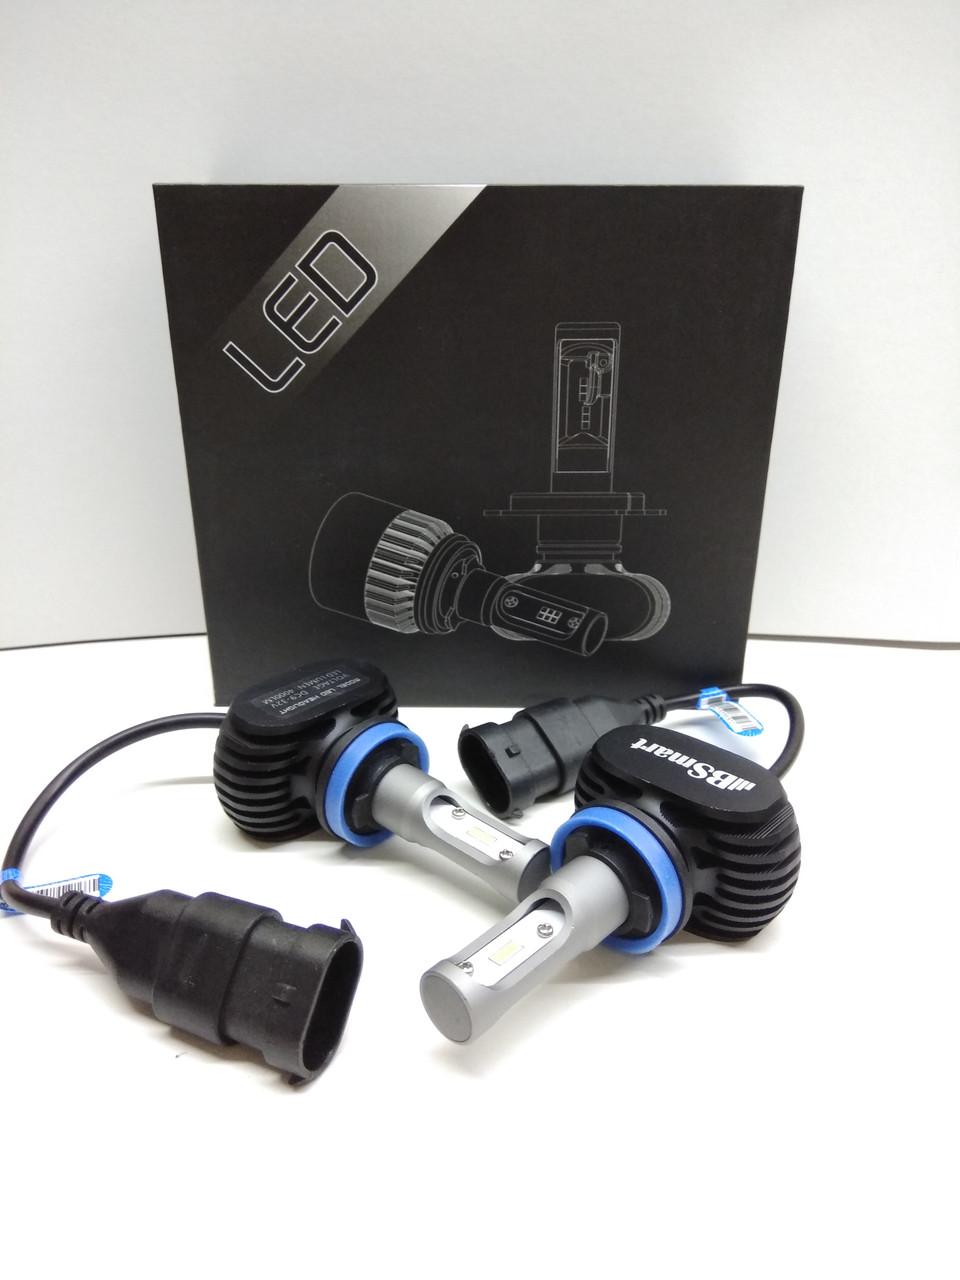 Автолампы LED S1 диод CSP Южная Корея, H8, 8000LM, 50W, 9-32V